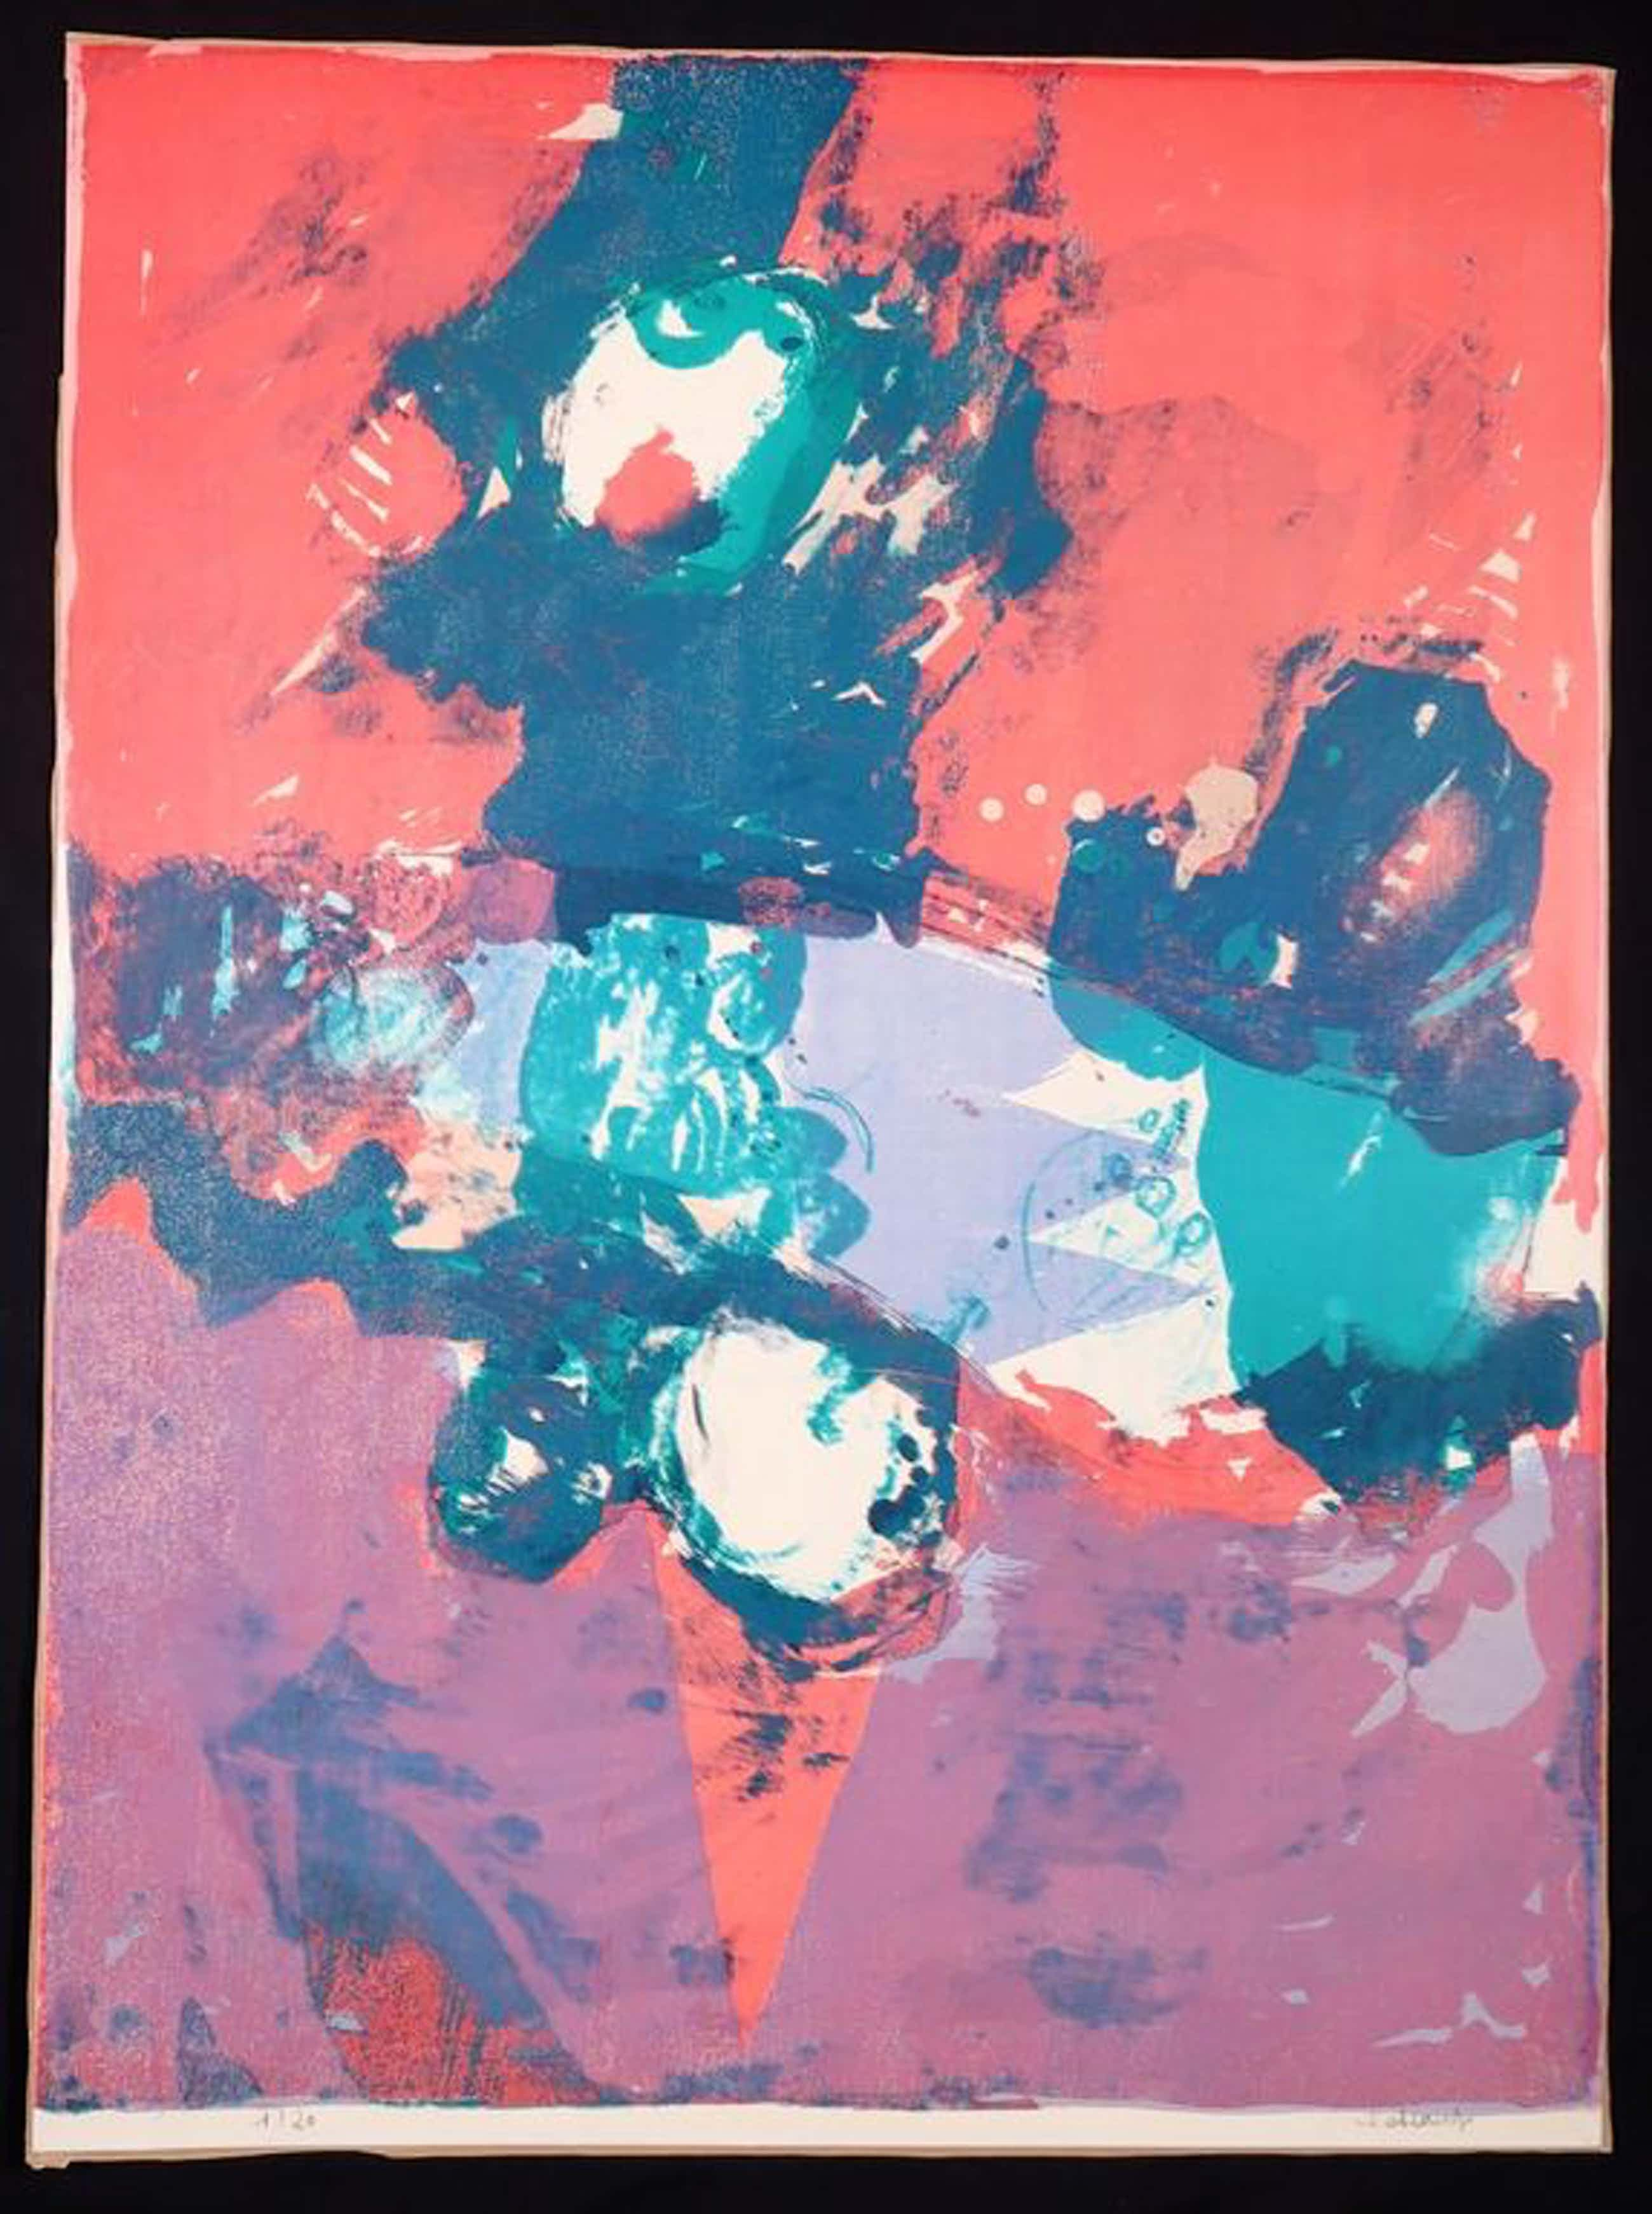 Jan Cobbaert: Litho, Abstract composition kopen? Bied vanaf 130!